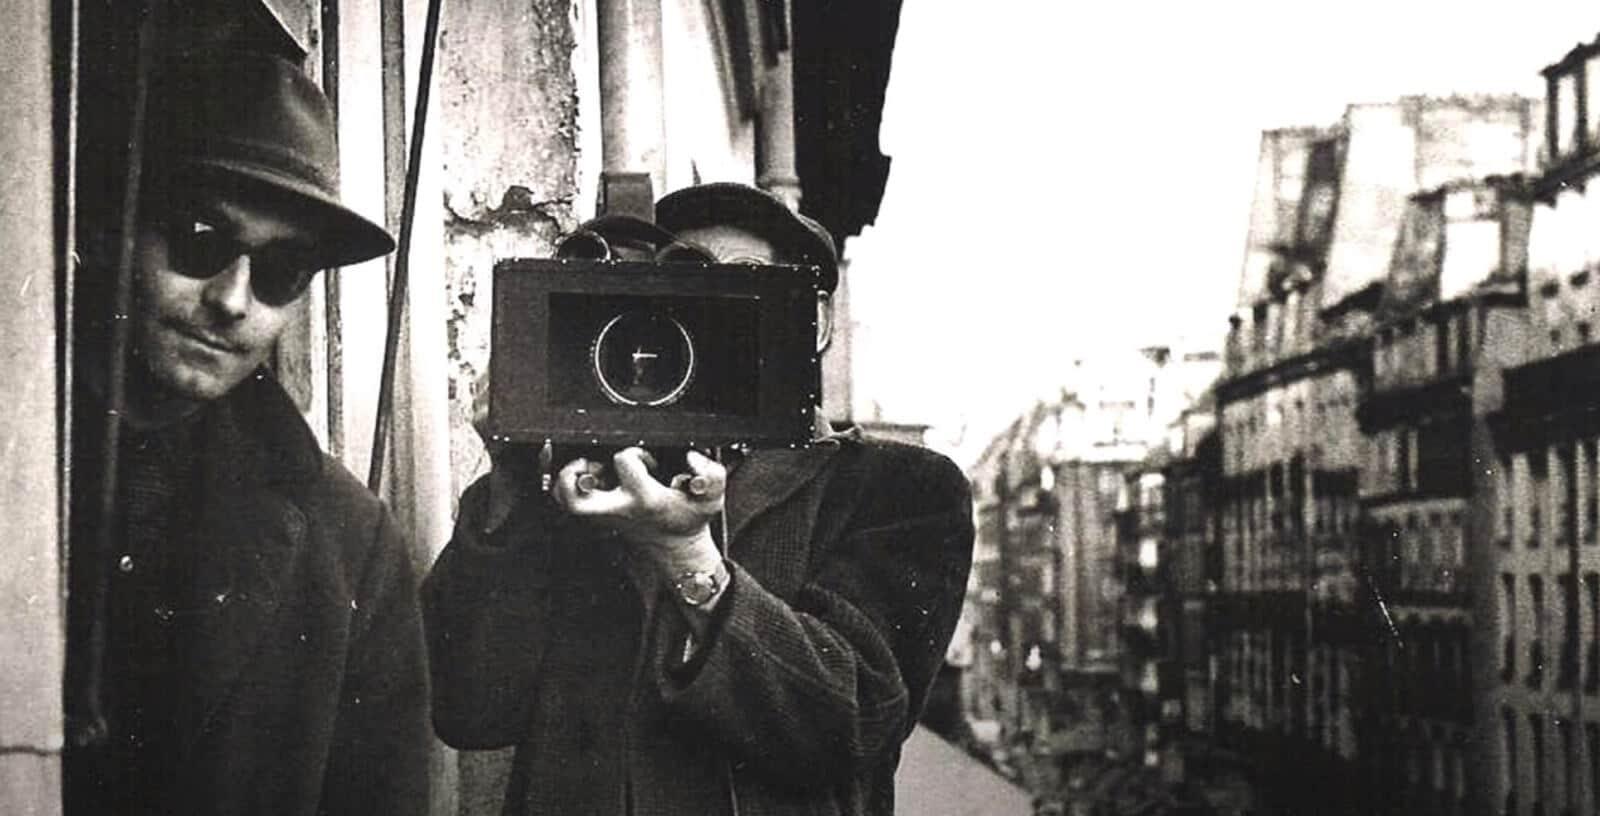 What is Hand-Held Shot - Jean-Luc Godard Shooting Handheld